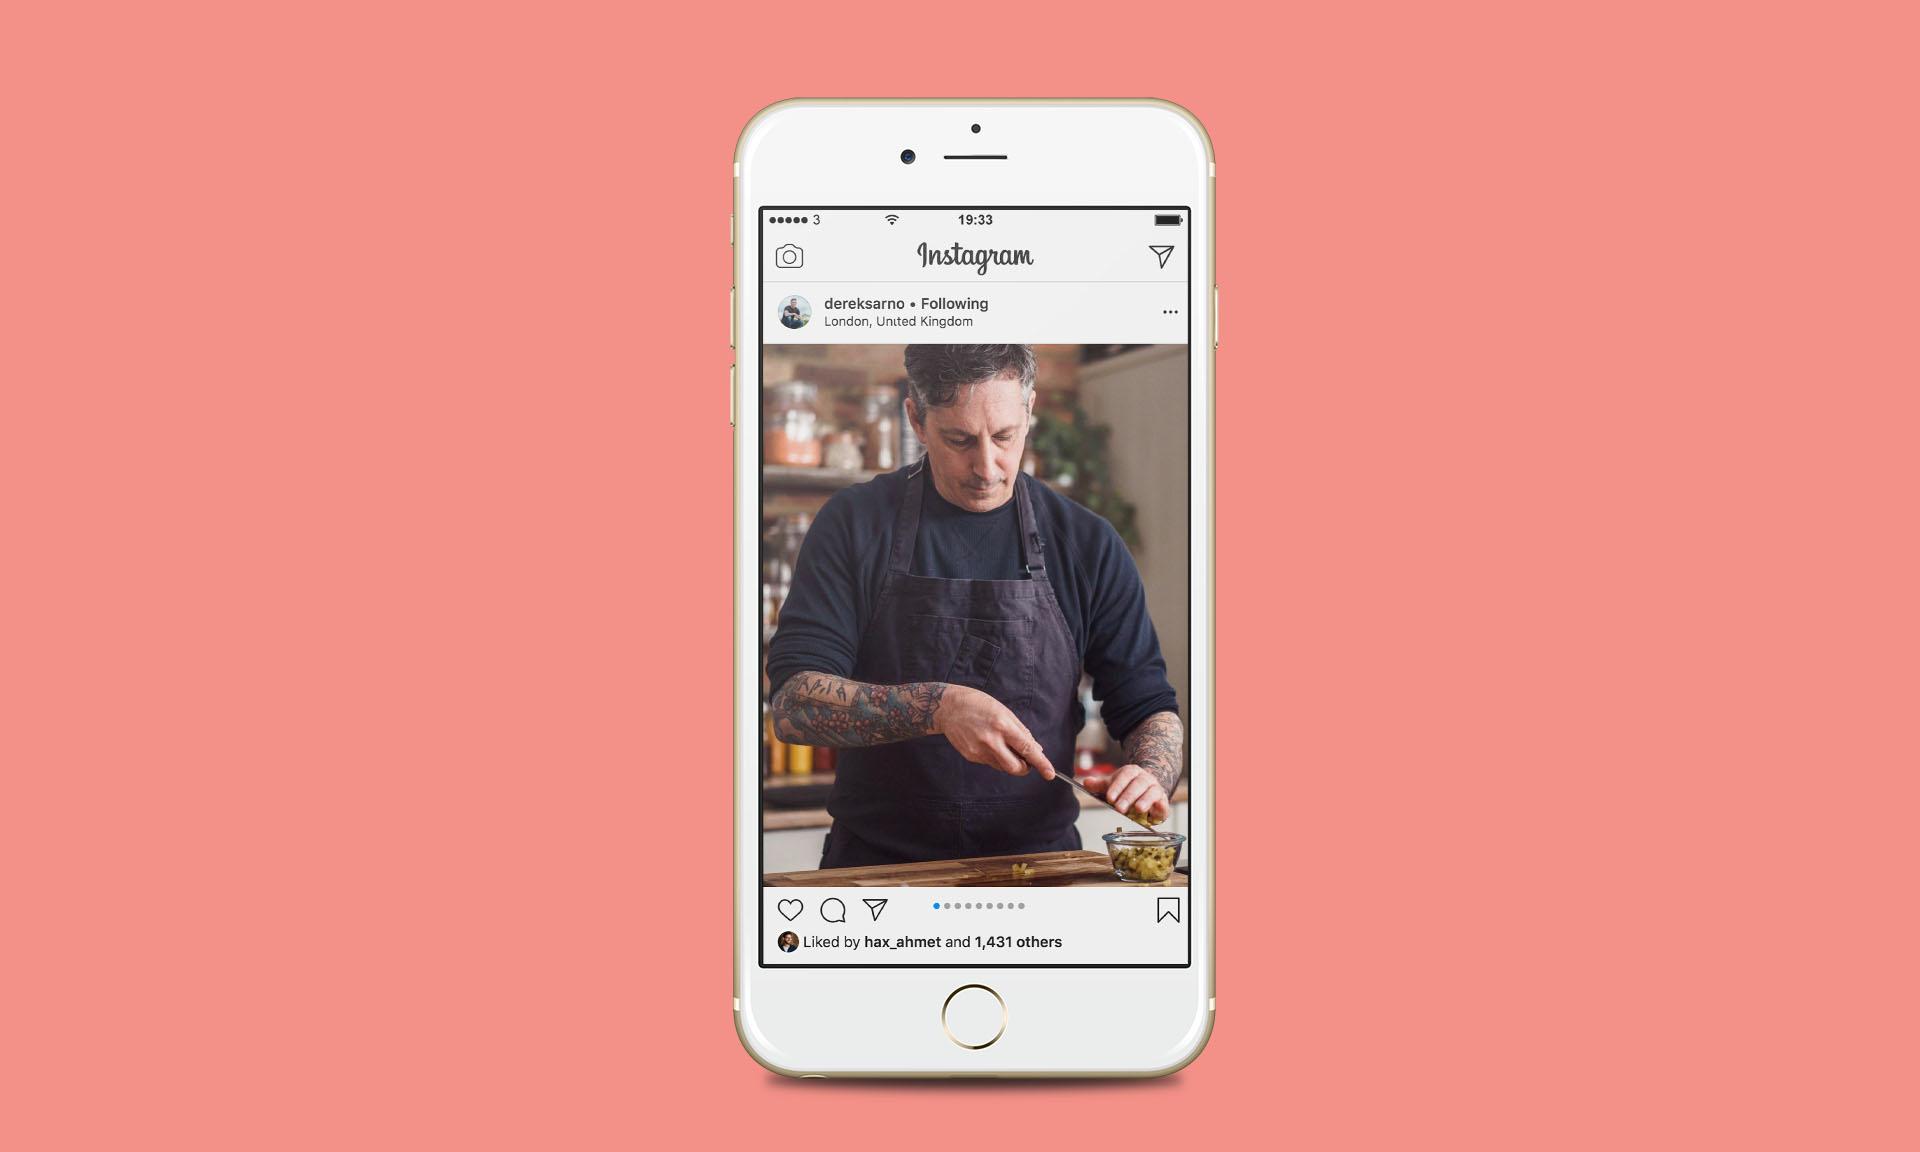 Derek Sarno of Wicked Kitchen shown on instagram on mobile sliding chopped vegetables off knife